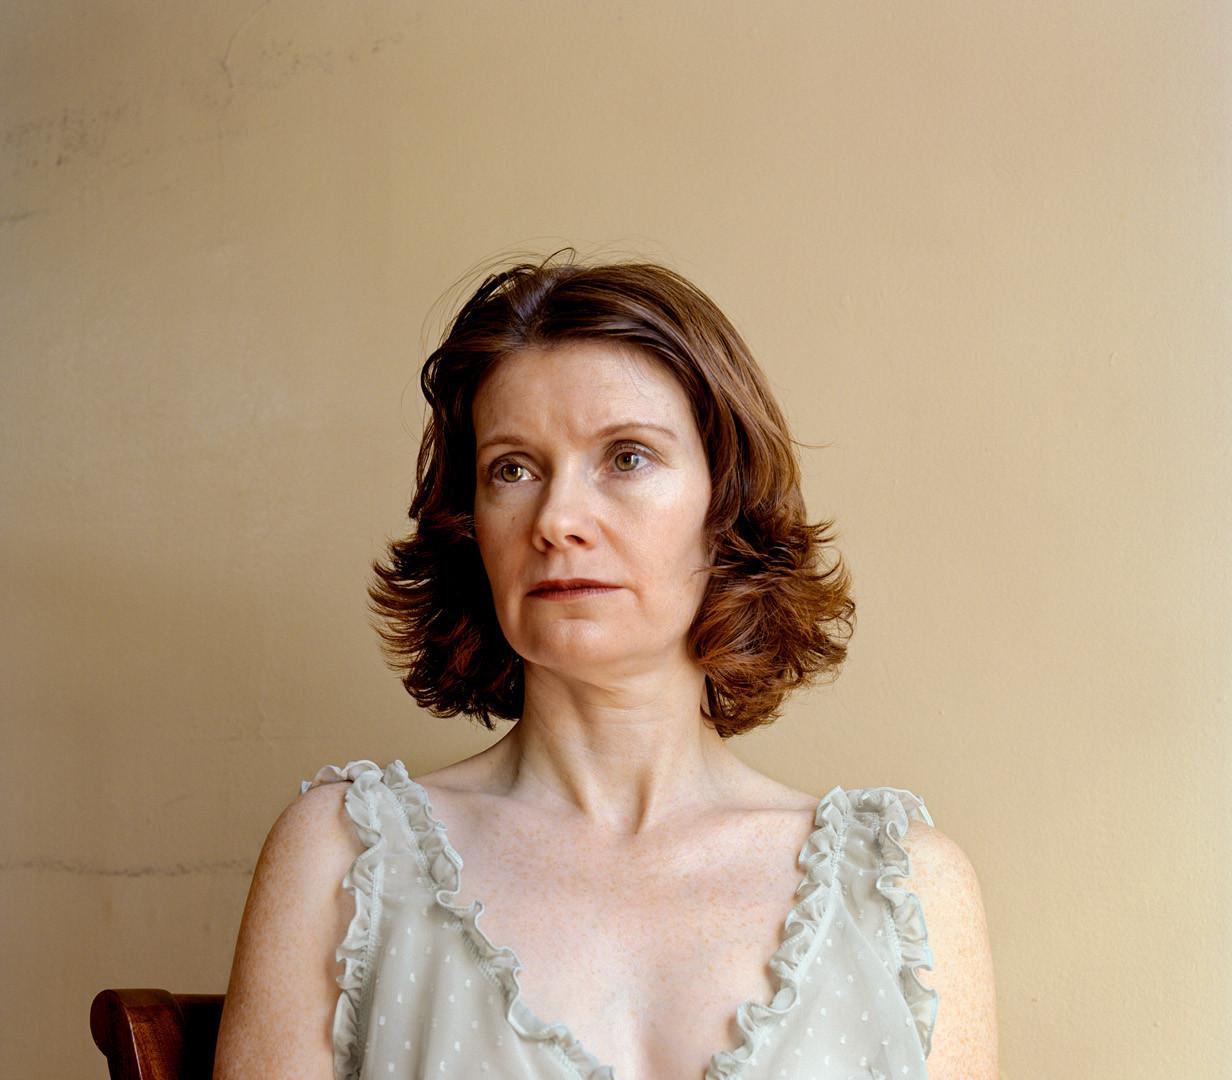 Jocelyn Lee, Untitled (Margie at Chelsea Hotel), 2009